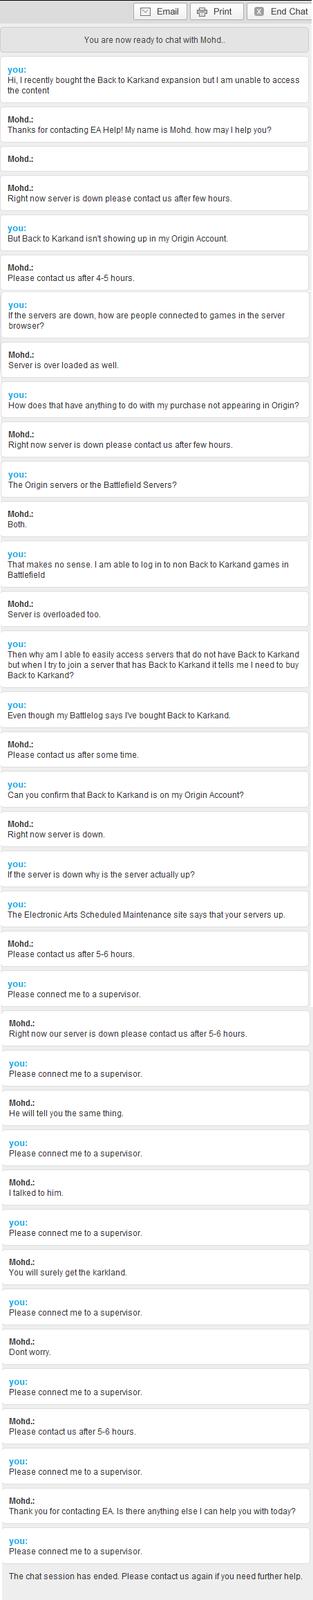 Customer Service chat - Battlefield edtion